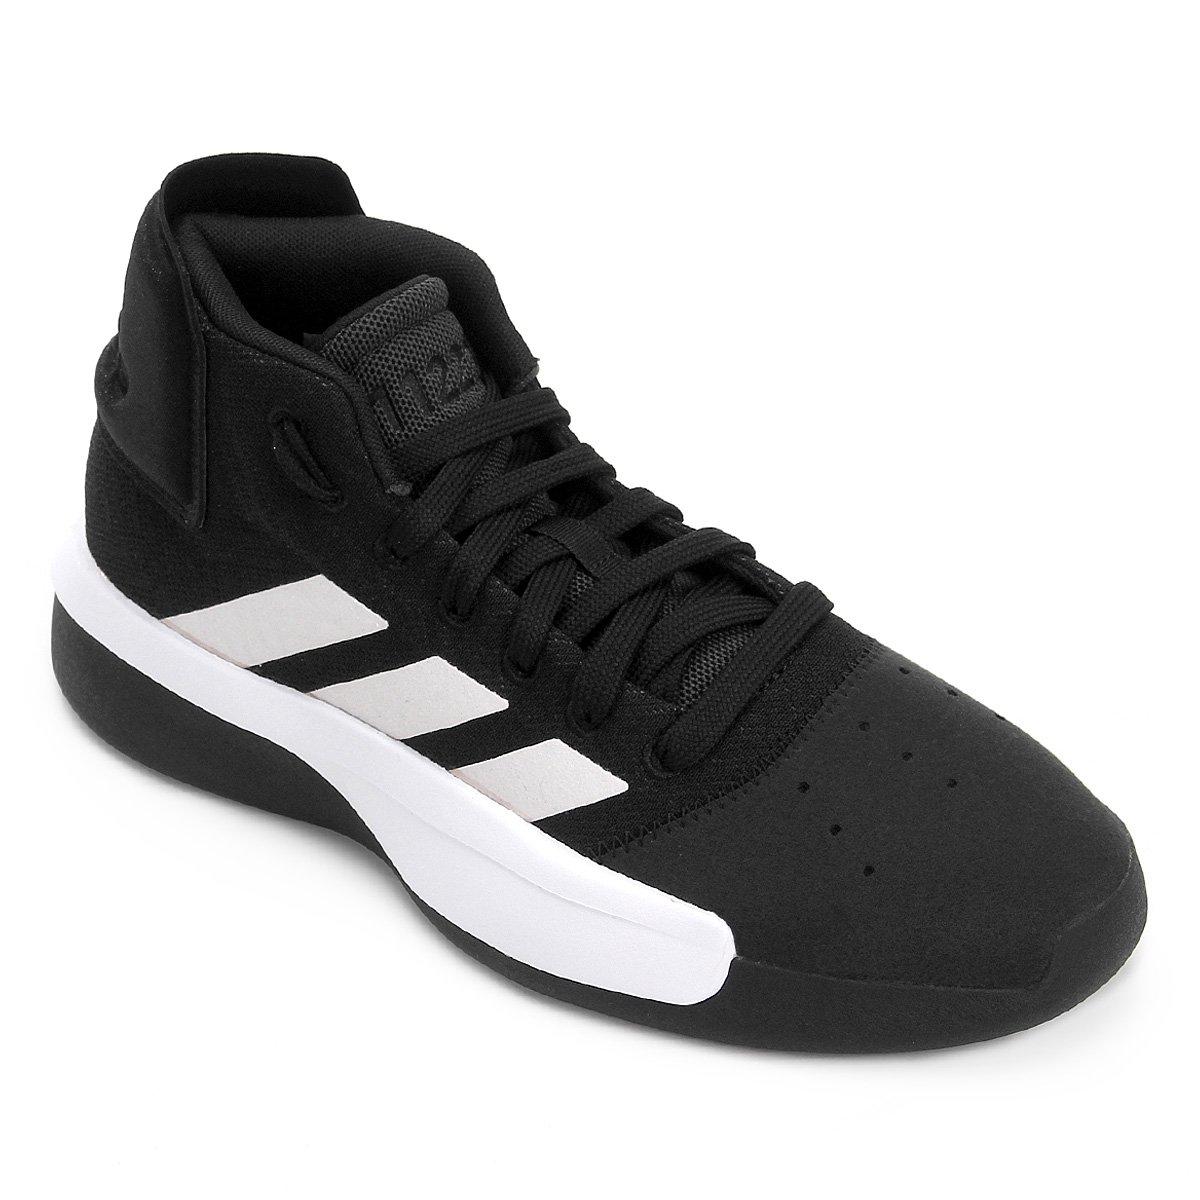 3e403d06bc Tênis Adidas Pro Adversary 2019 Masculino - Preto e Branco | Loja NBA